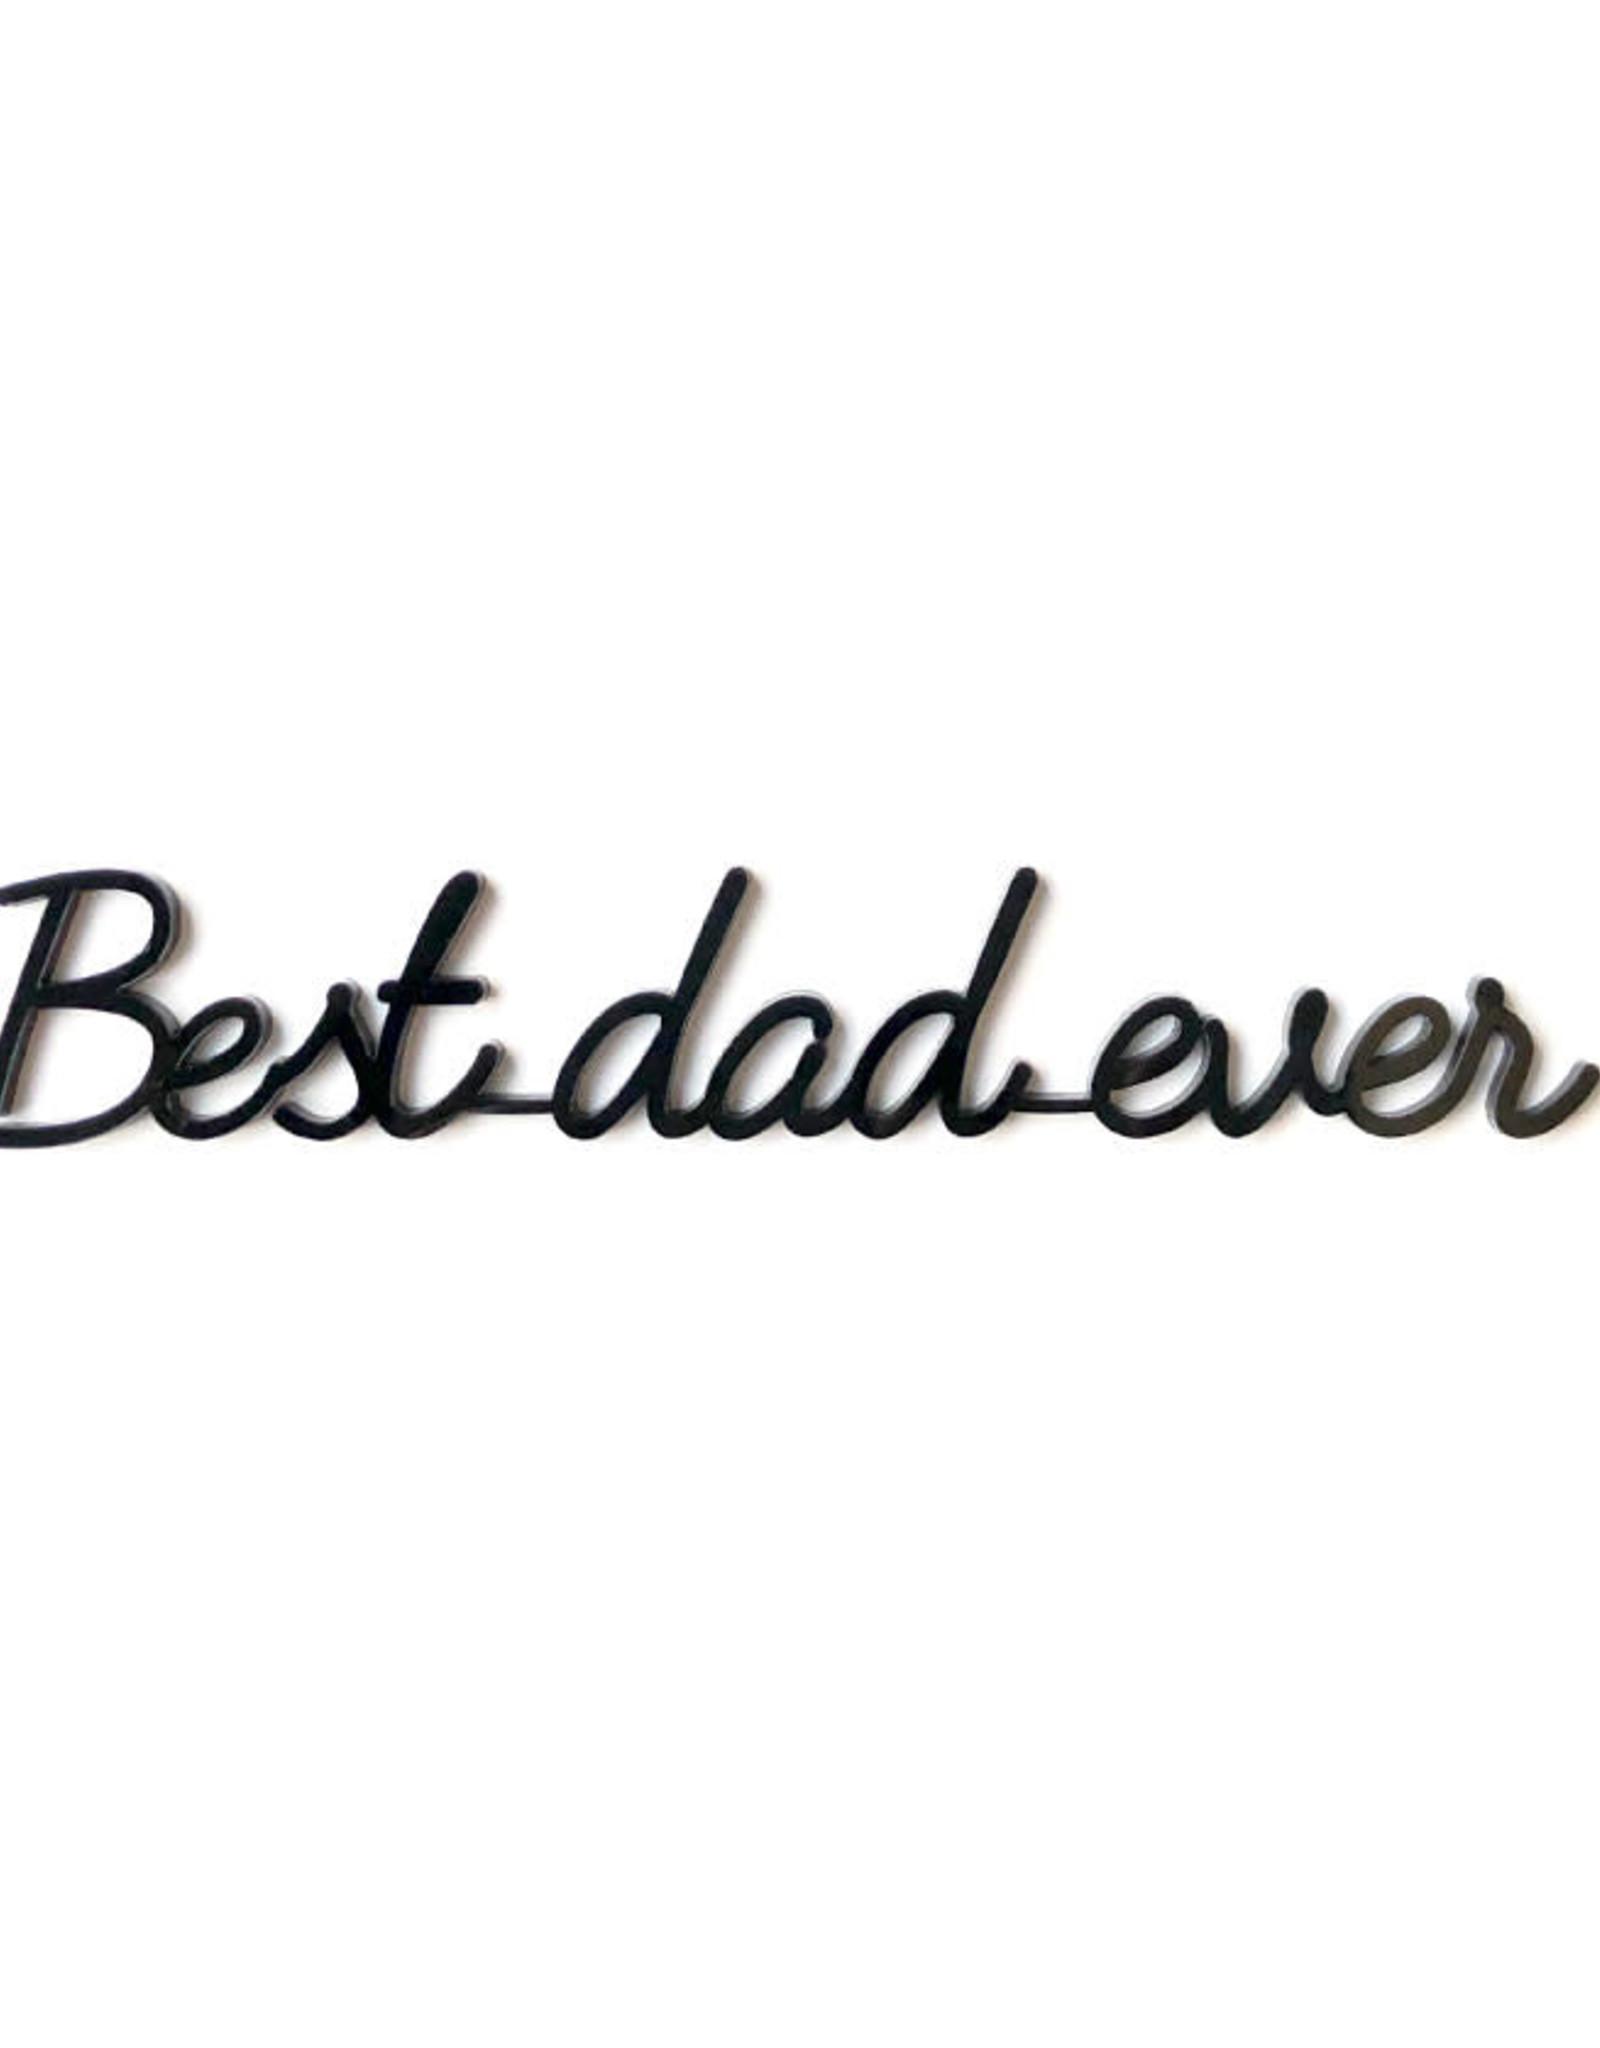 Goegezegd Quote Best dad ever-black